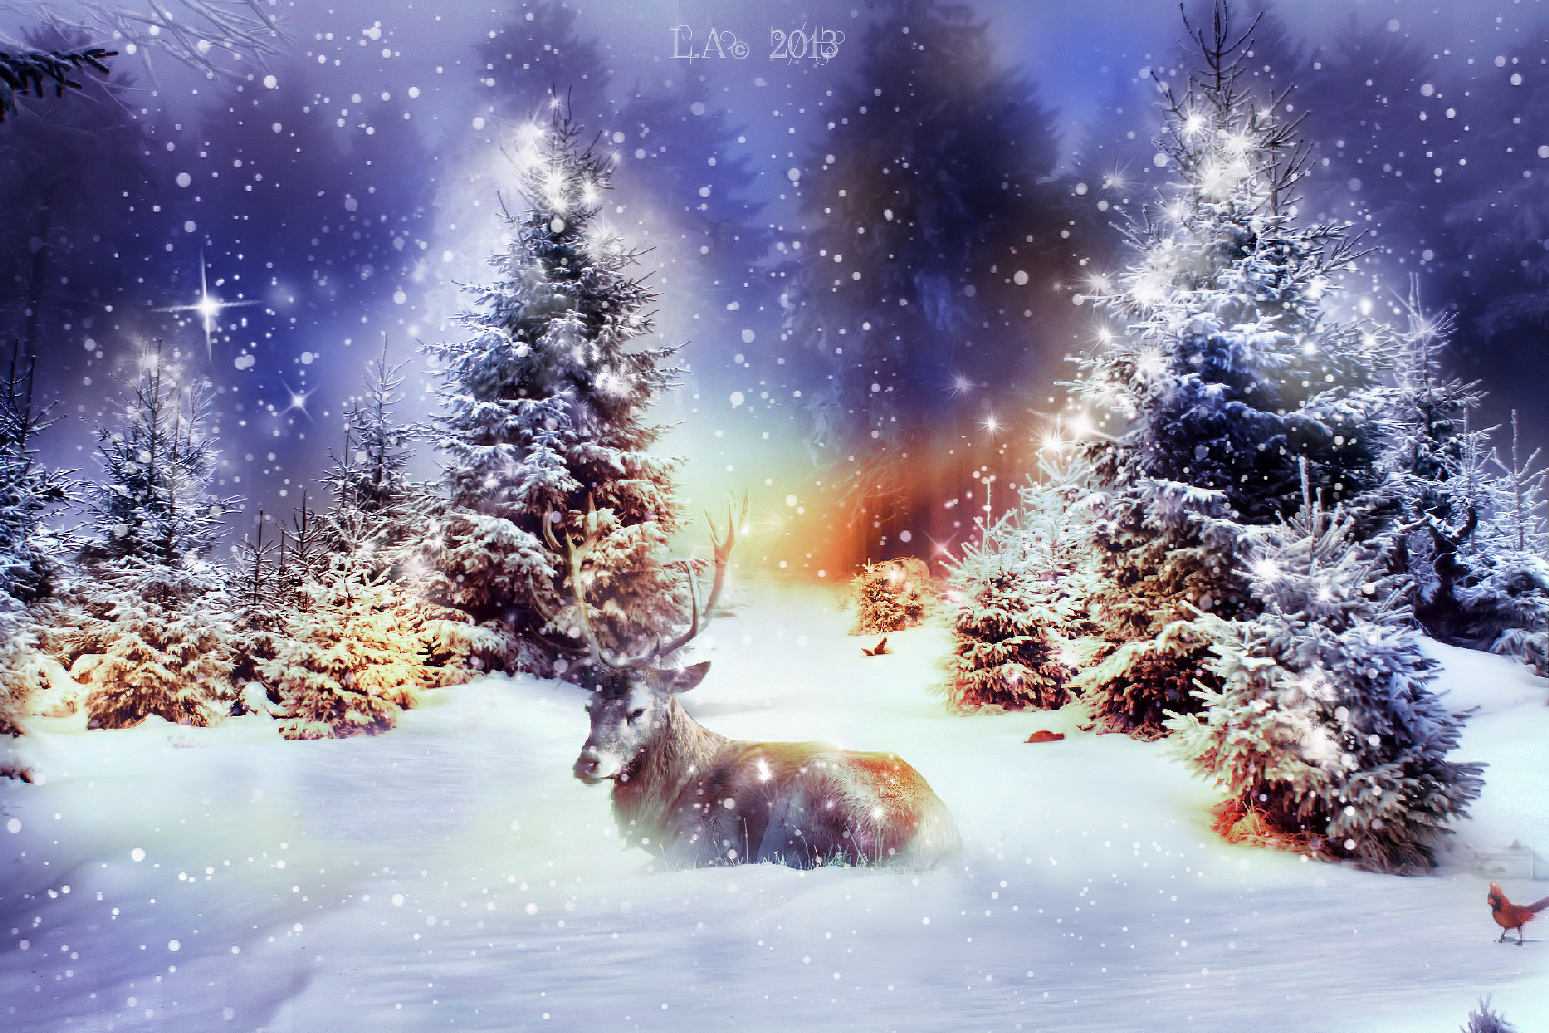 Winter Christmas Wallpaper Mobile at Landscape Monodomo 1549x1033